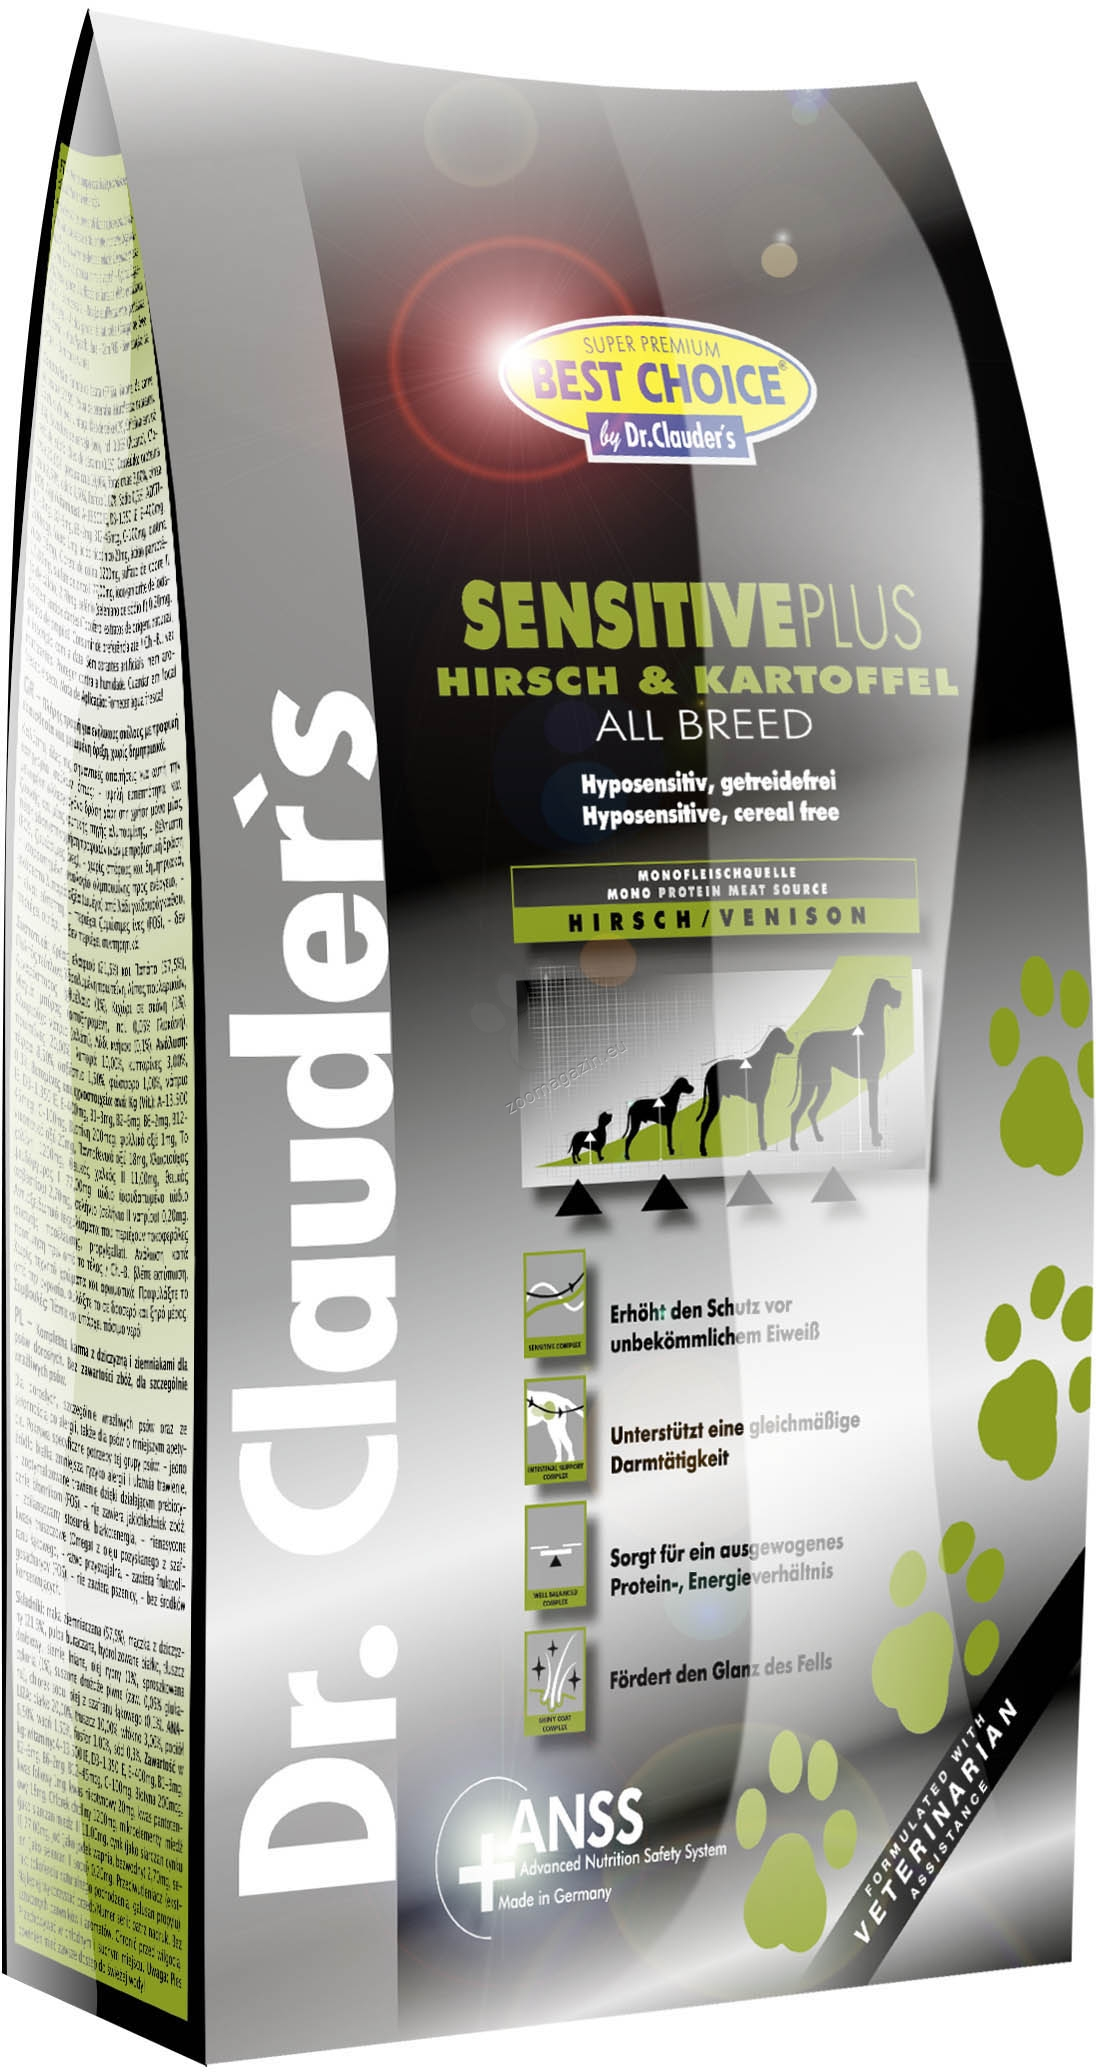 Dr.Clauder Super Premium Hyposensitive All Breed Venison & Potato - с еленско месо и картофи, подходяща за всички породи кучета над 12 месеца 3.5 кг.